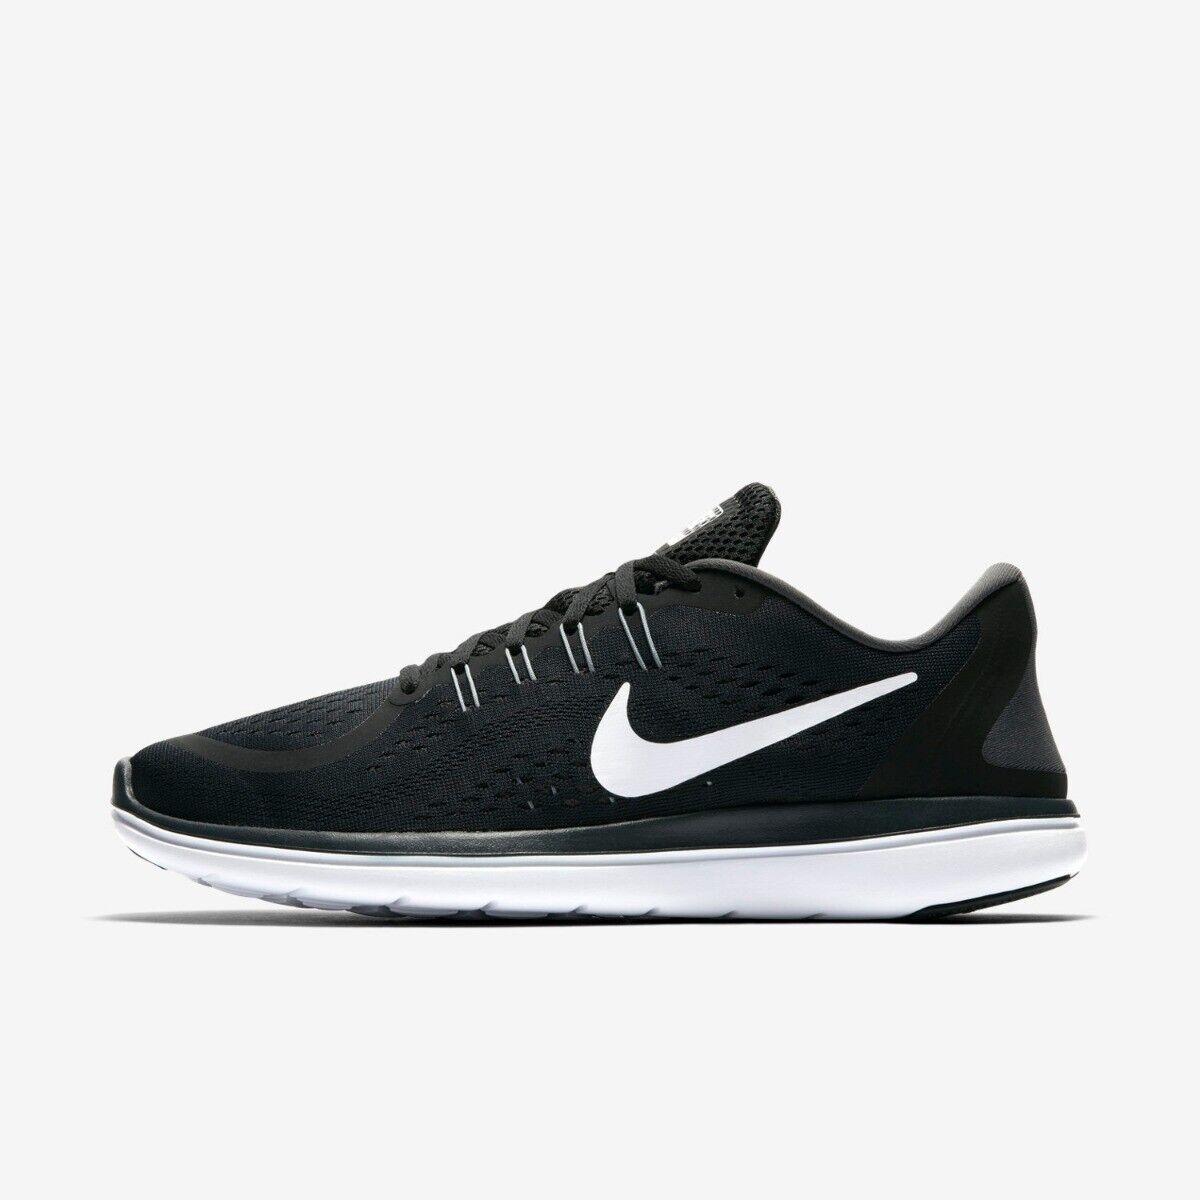 Nike Flex 2017 RN para hombre entrenador zapatos talla 8 9 10 Negro blancoo Nuevo PVP  -